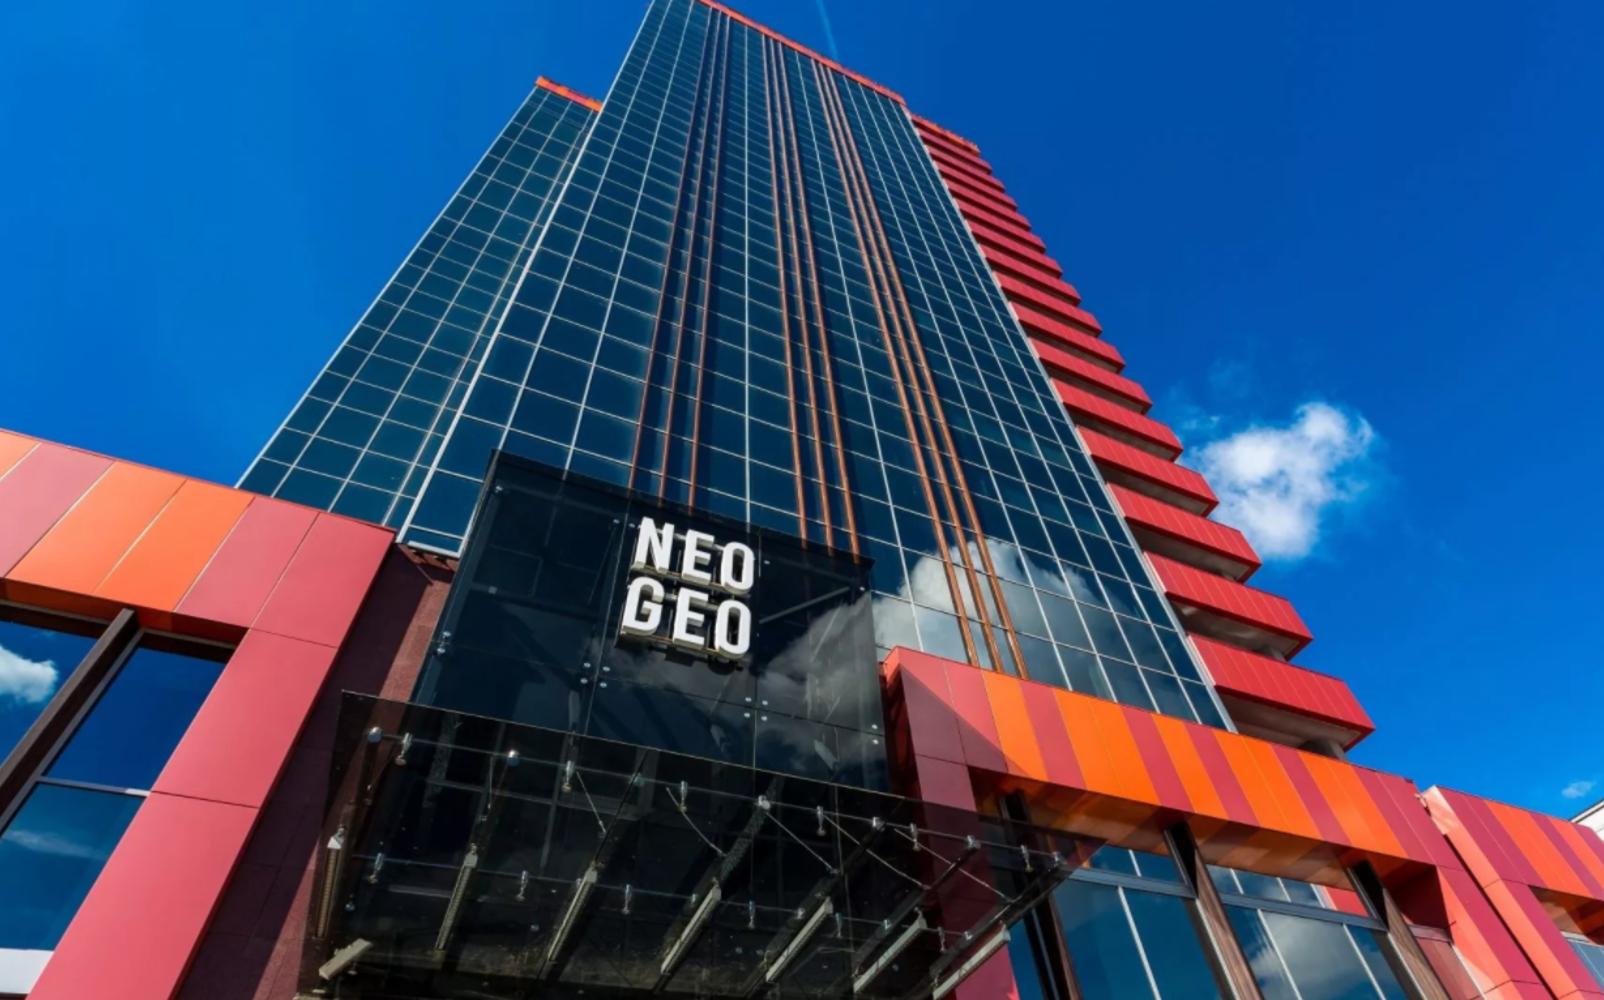 Офисная недвижимость Москва,  - Neo-Geo (Фаза II) - 2